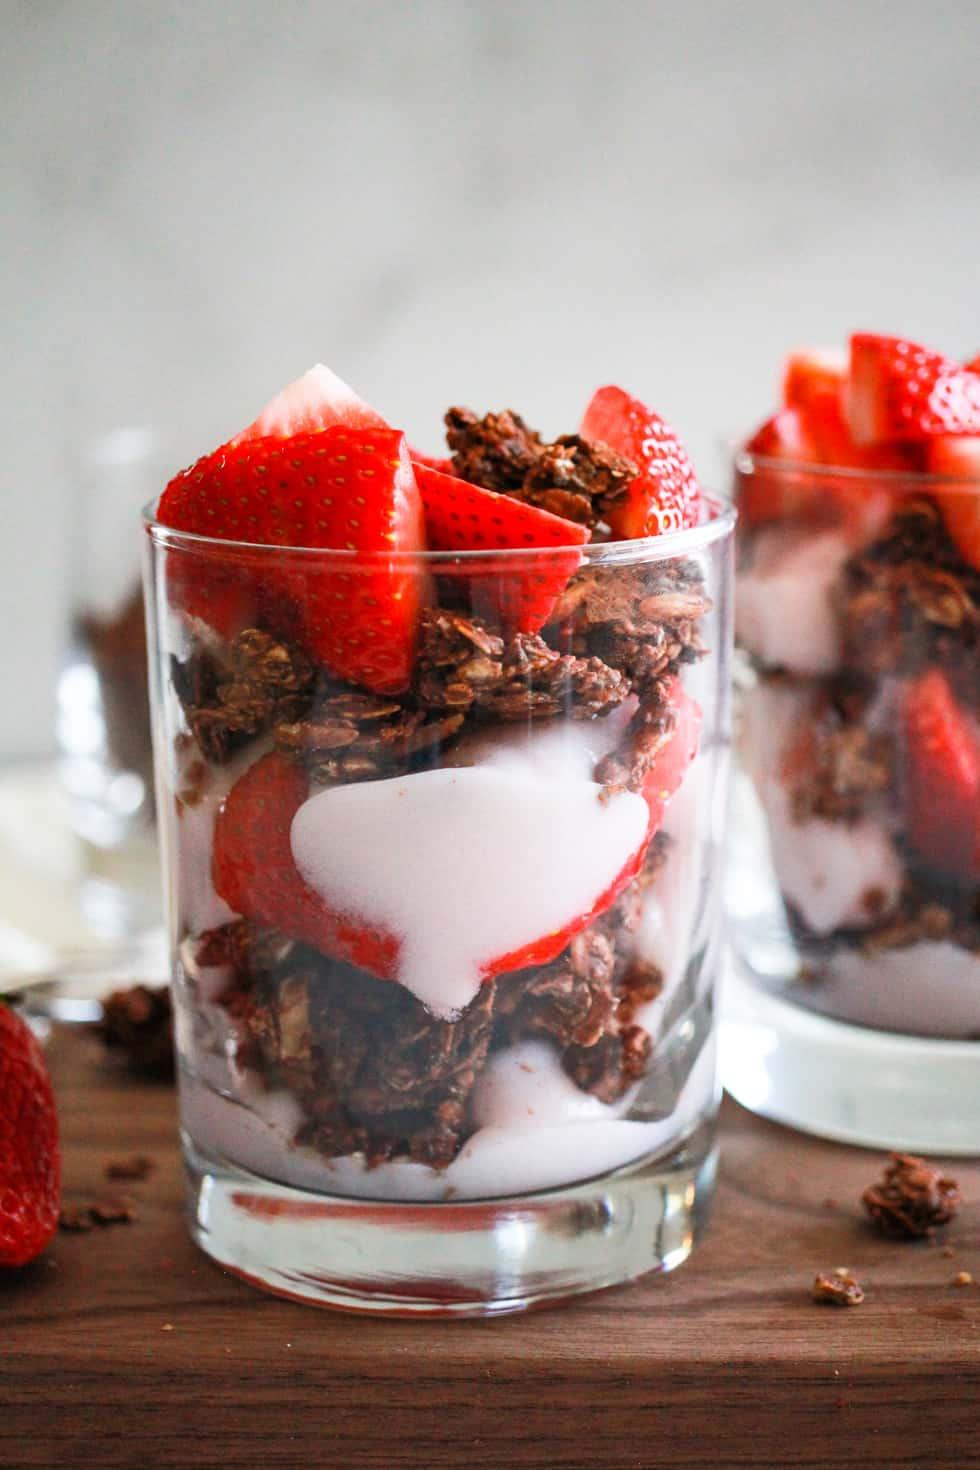 Vegan strawberry yogurt parfait in glass with chocolate granola.